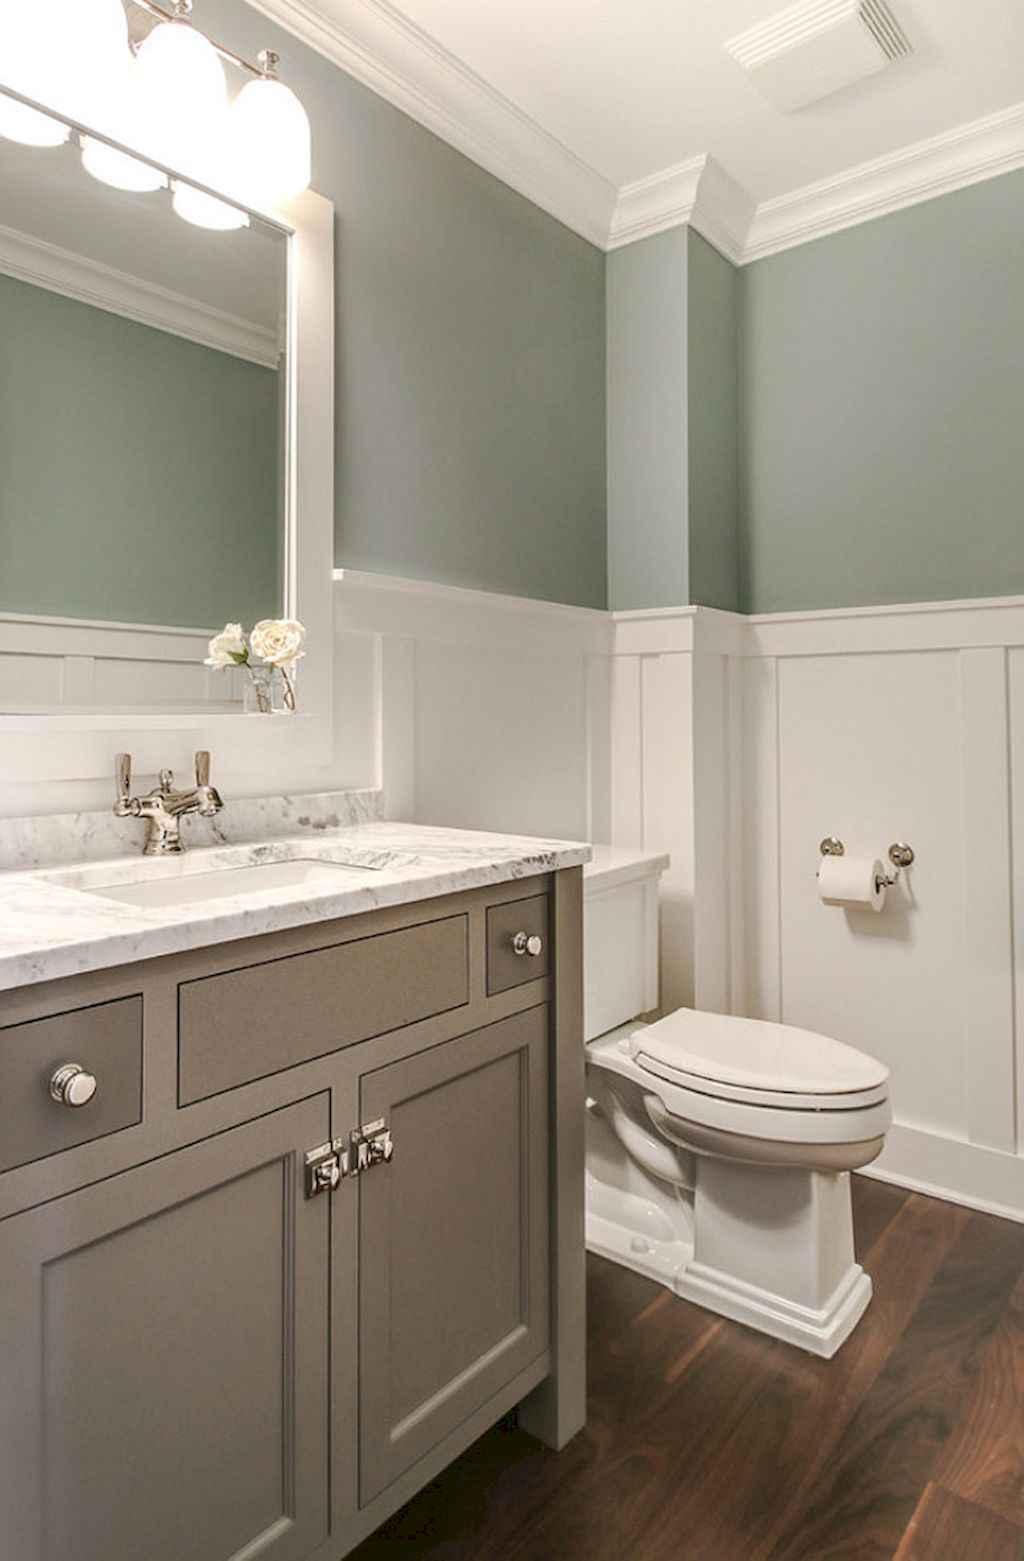 Inspiring apartment bathroom remodel ideas on a budget (21)